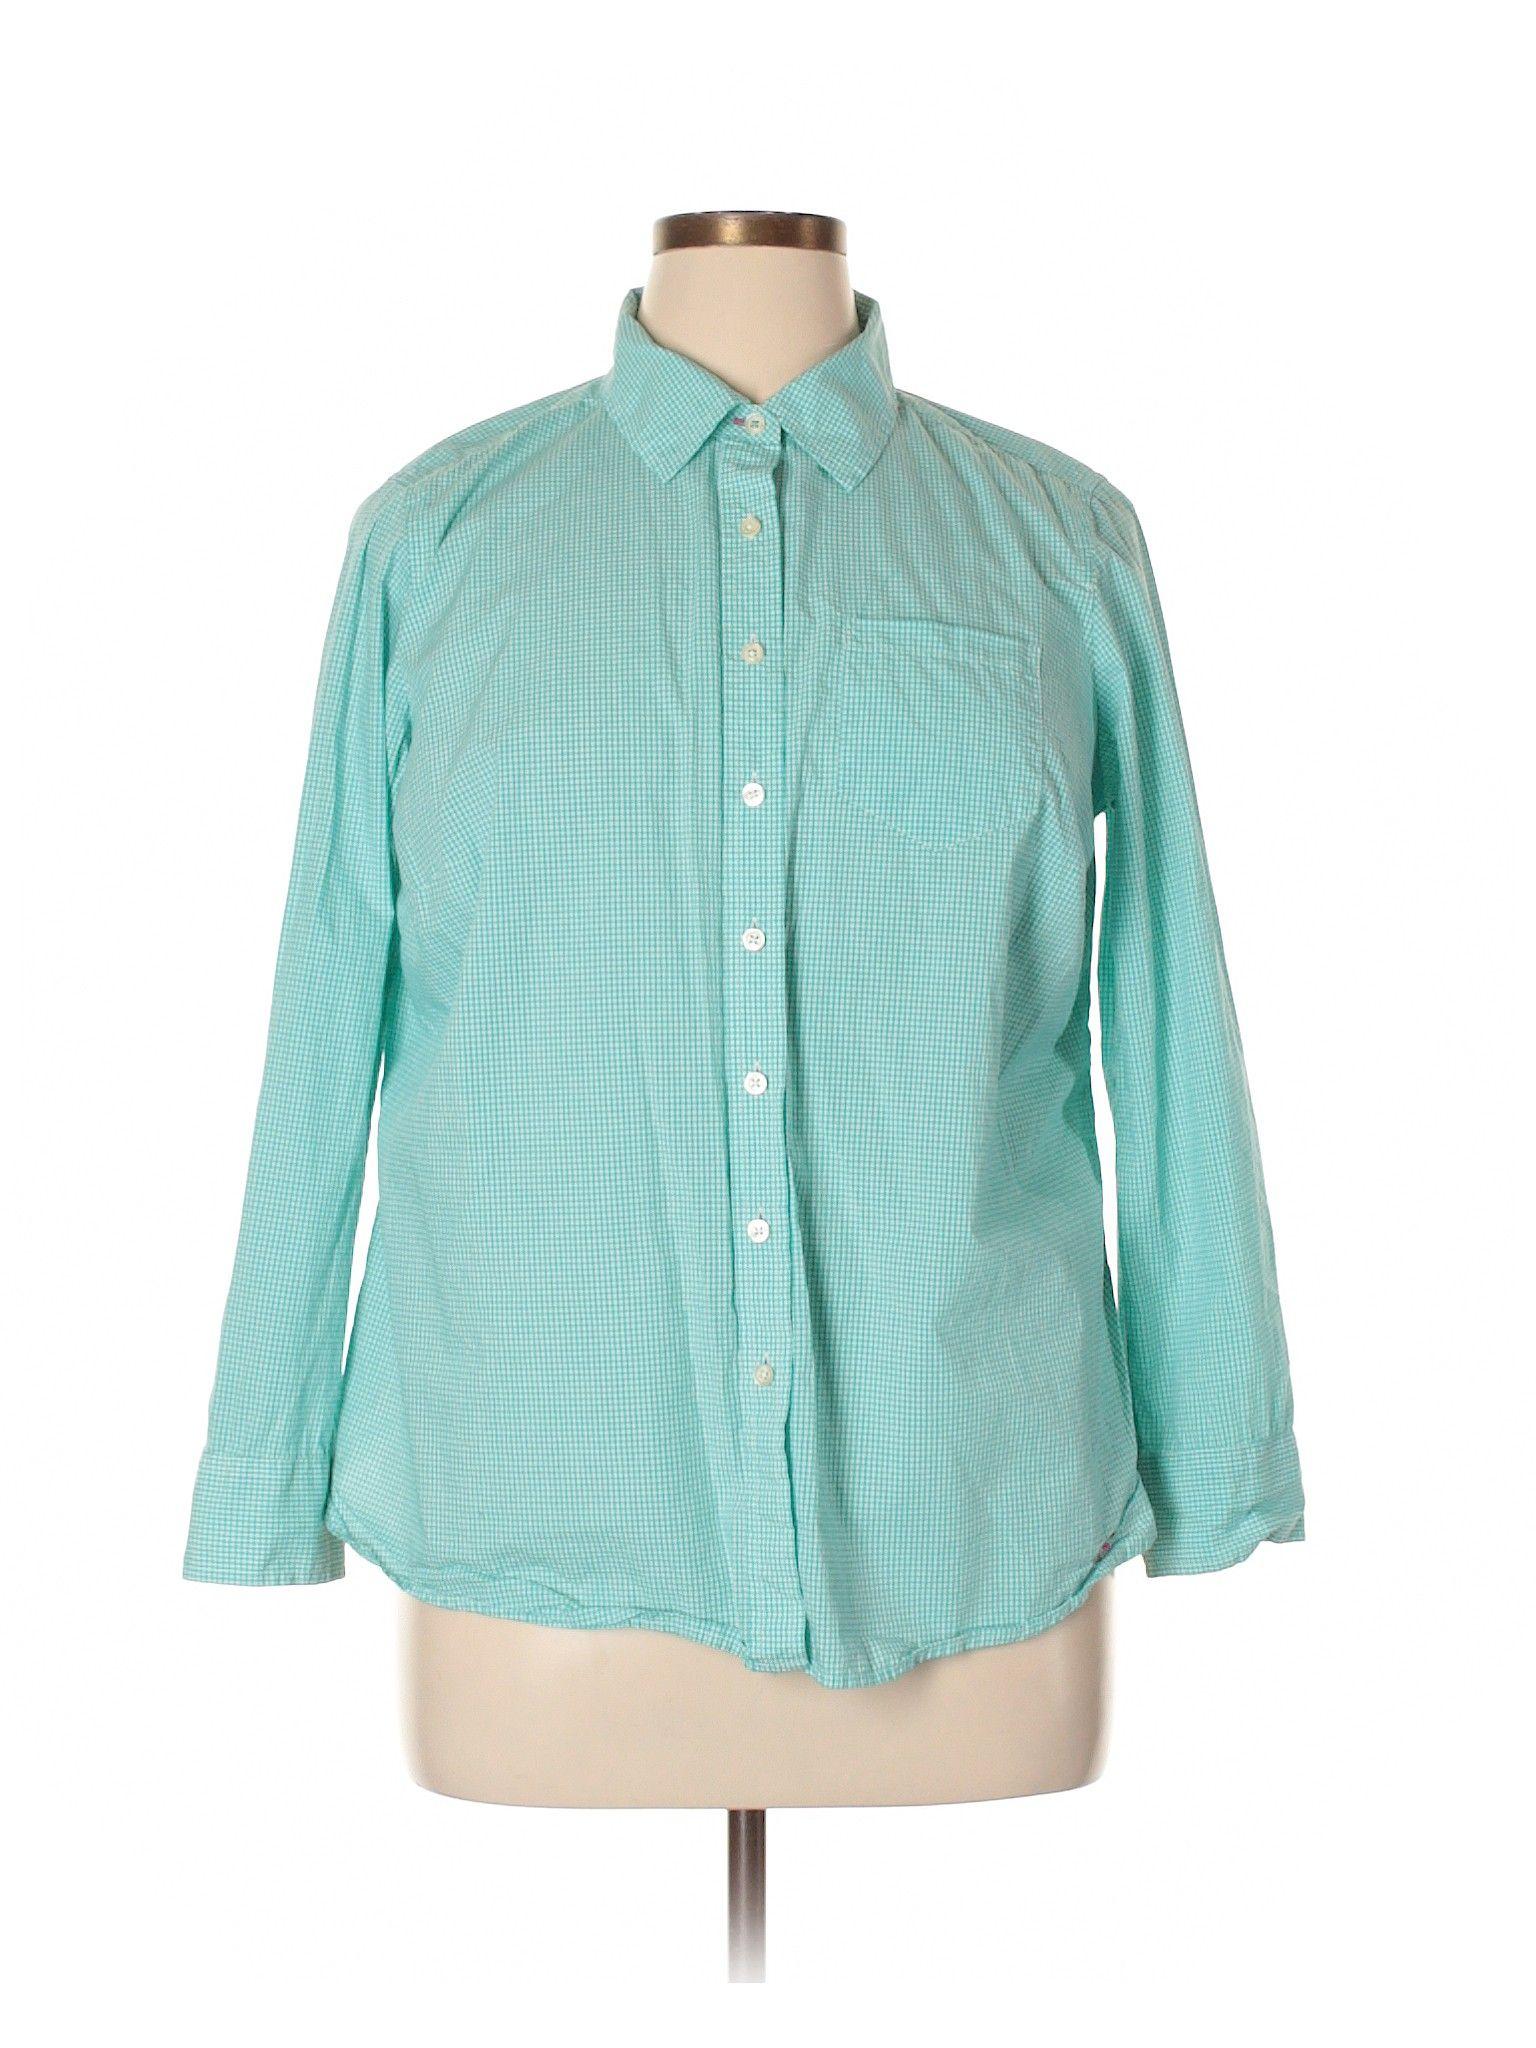 82568301 Talbots Long Sleeve Button Down Shirt: Size 18.00 Teal Women's Tops - $23.99